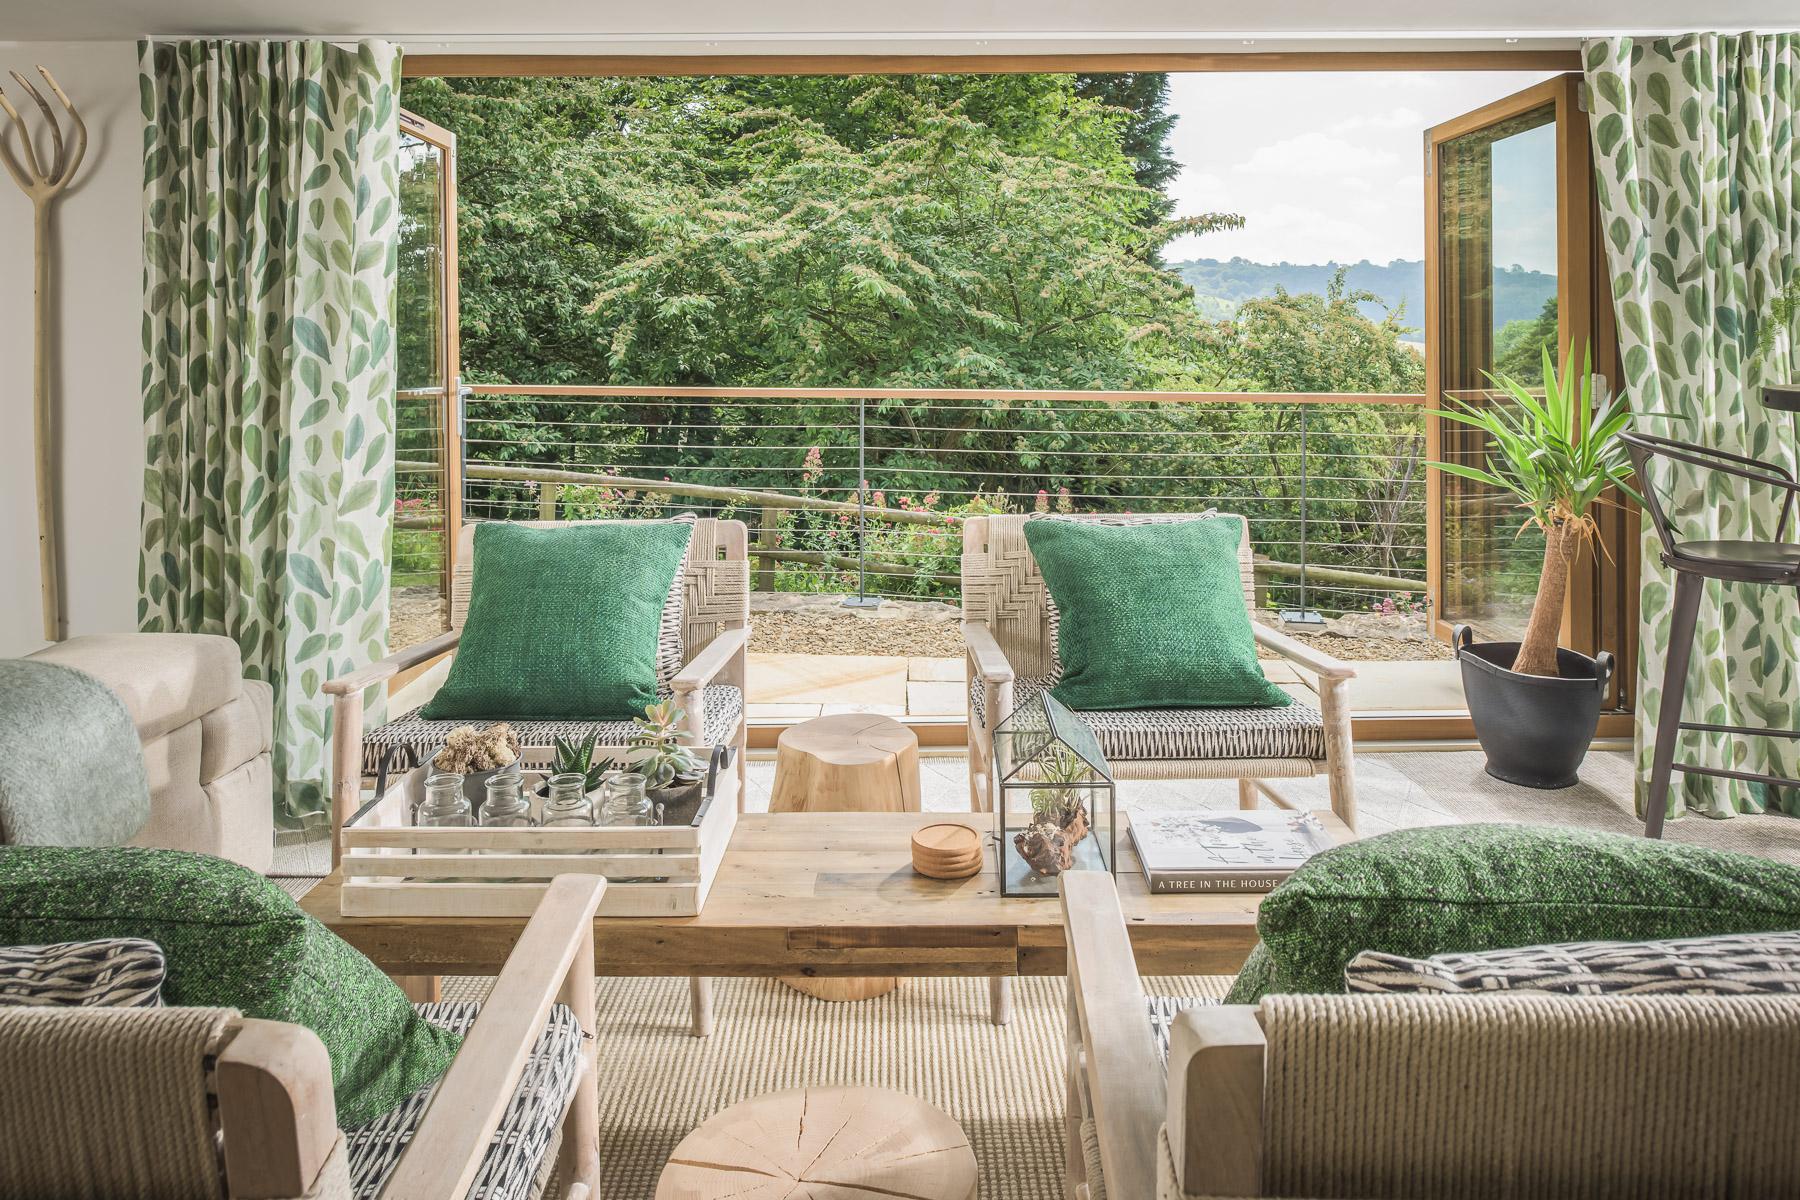 INTERIOR DESIGN & DECORATION   We design thoughtful, liveable spaces.